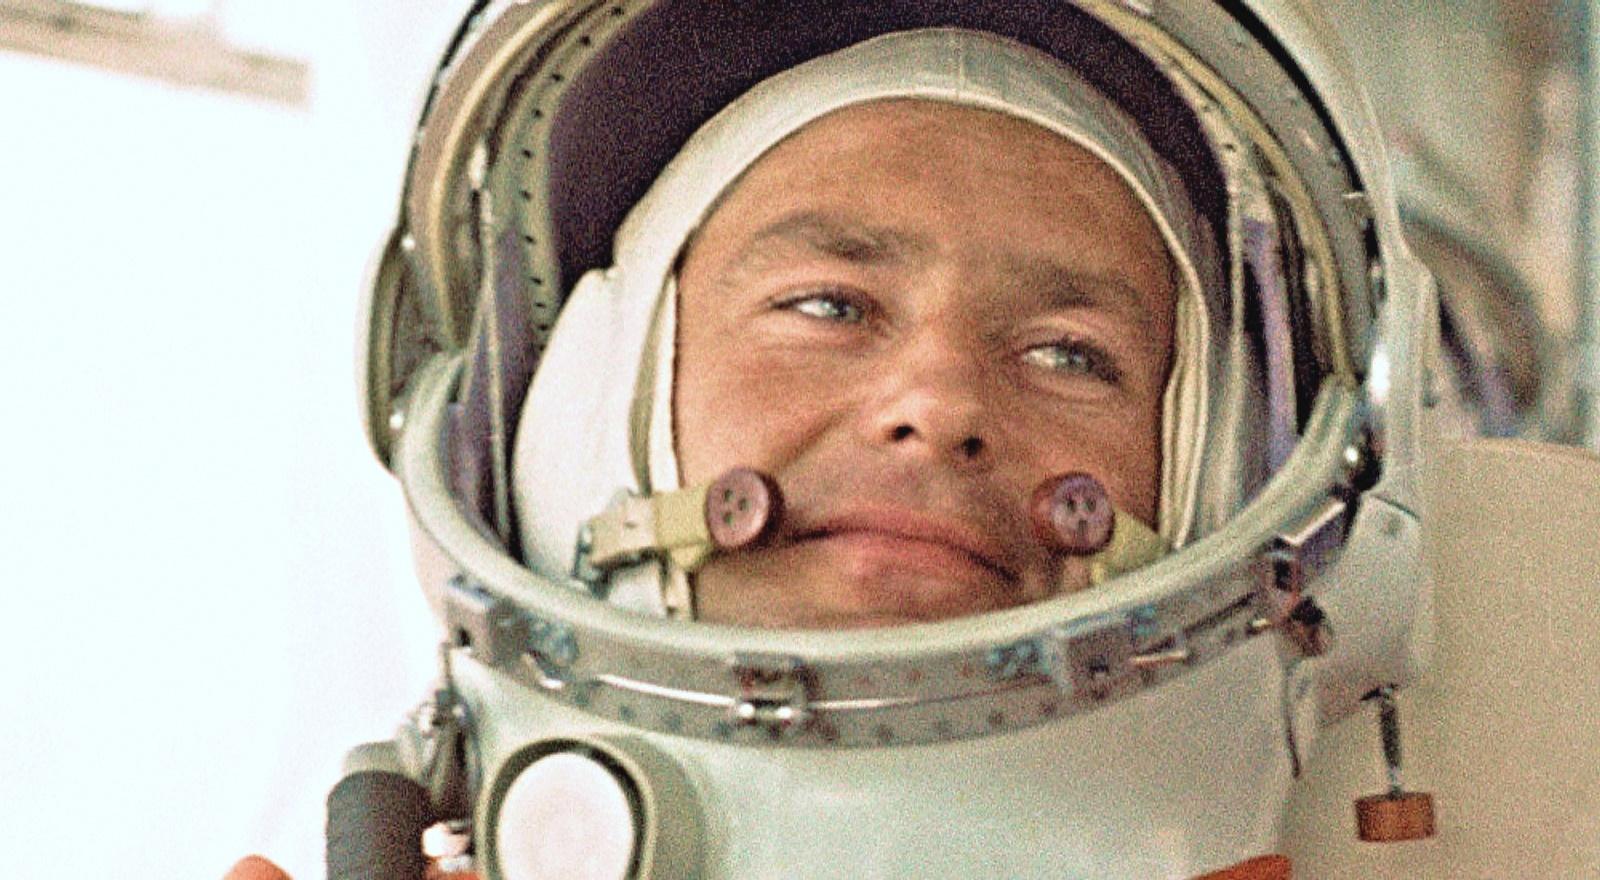 00 German Titov 02 russian cosmonaut 060816